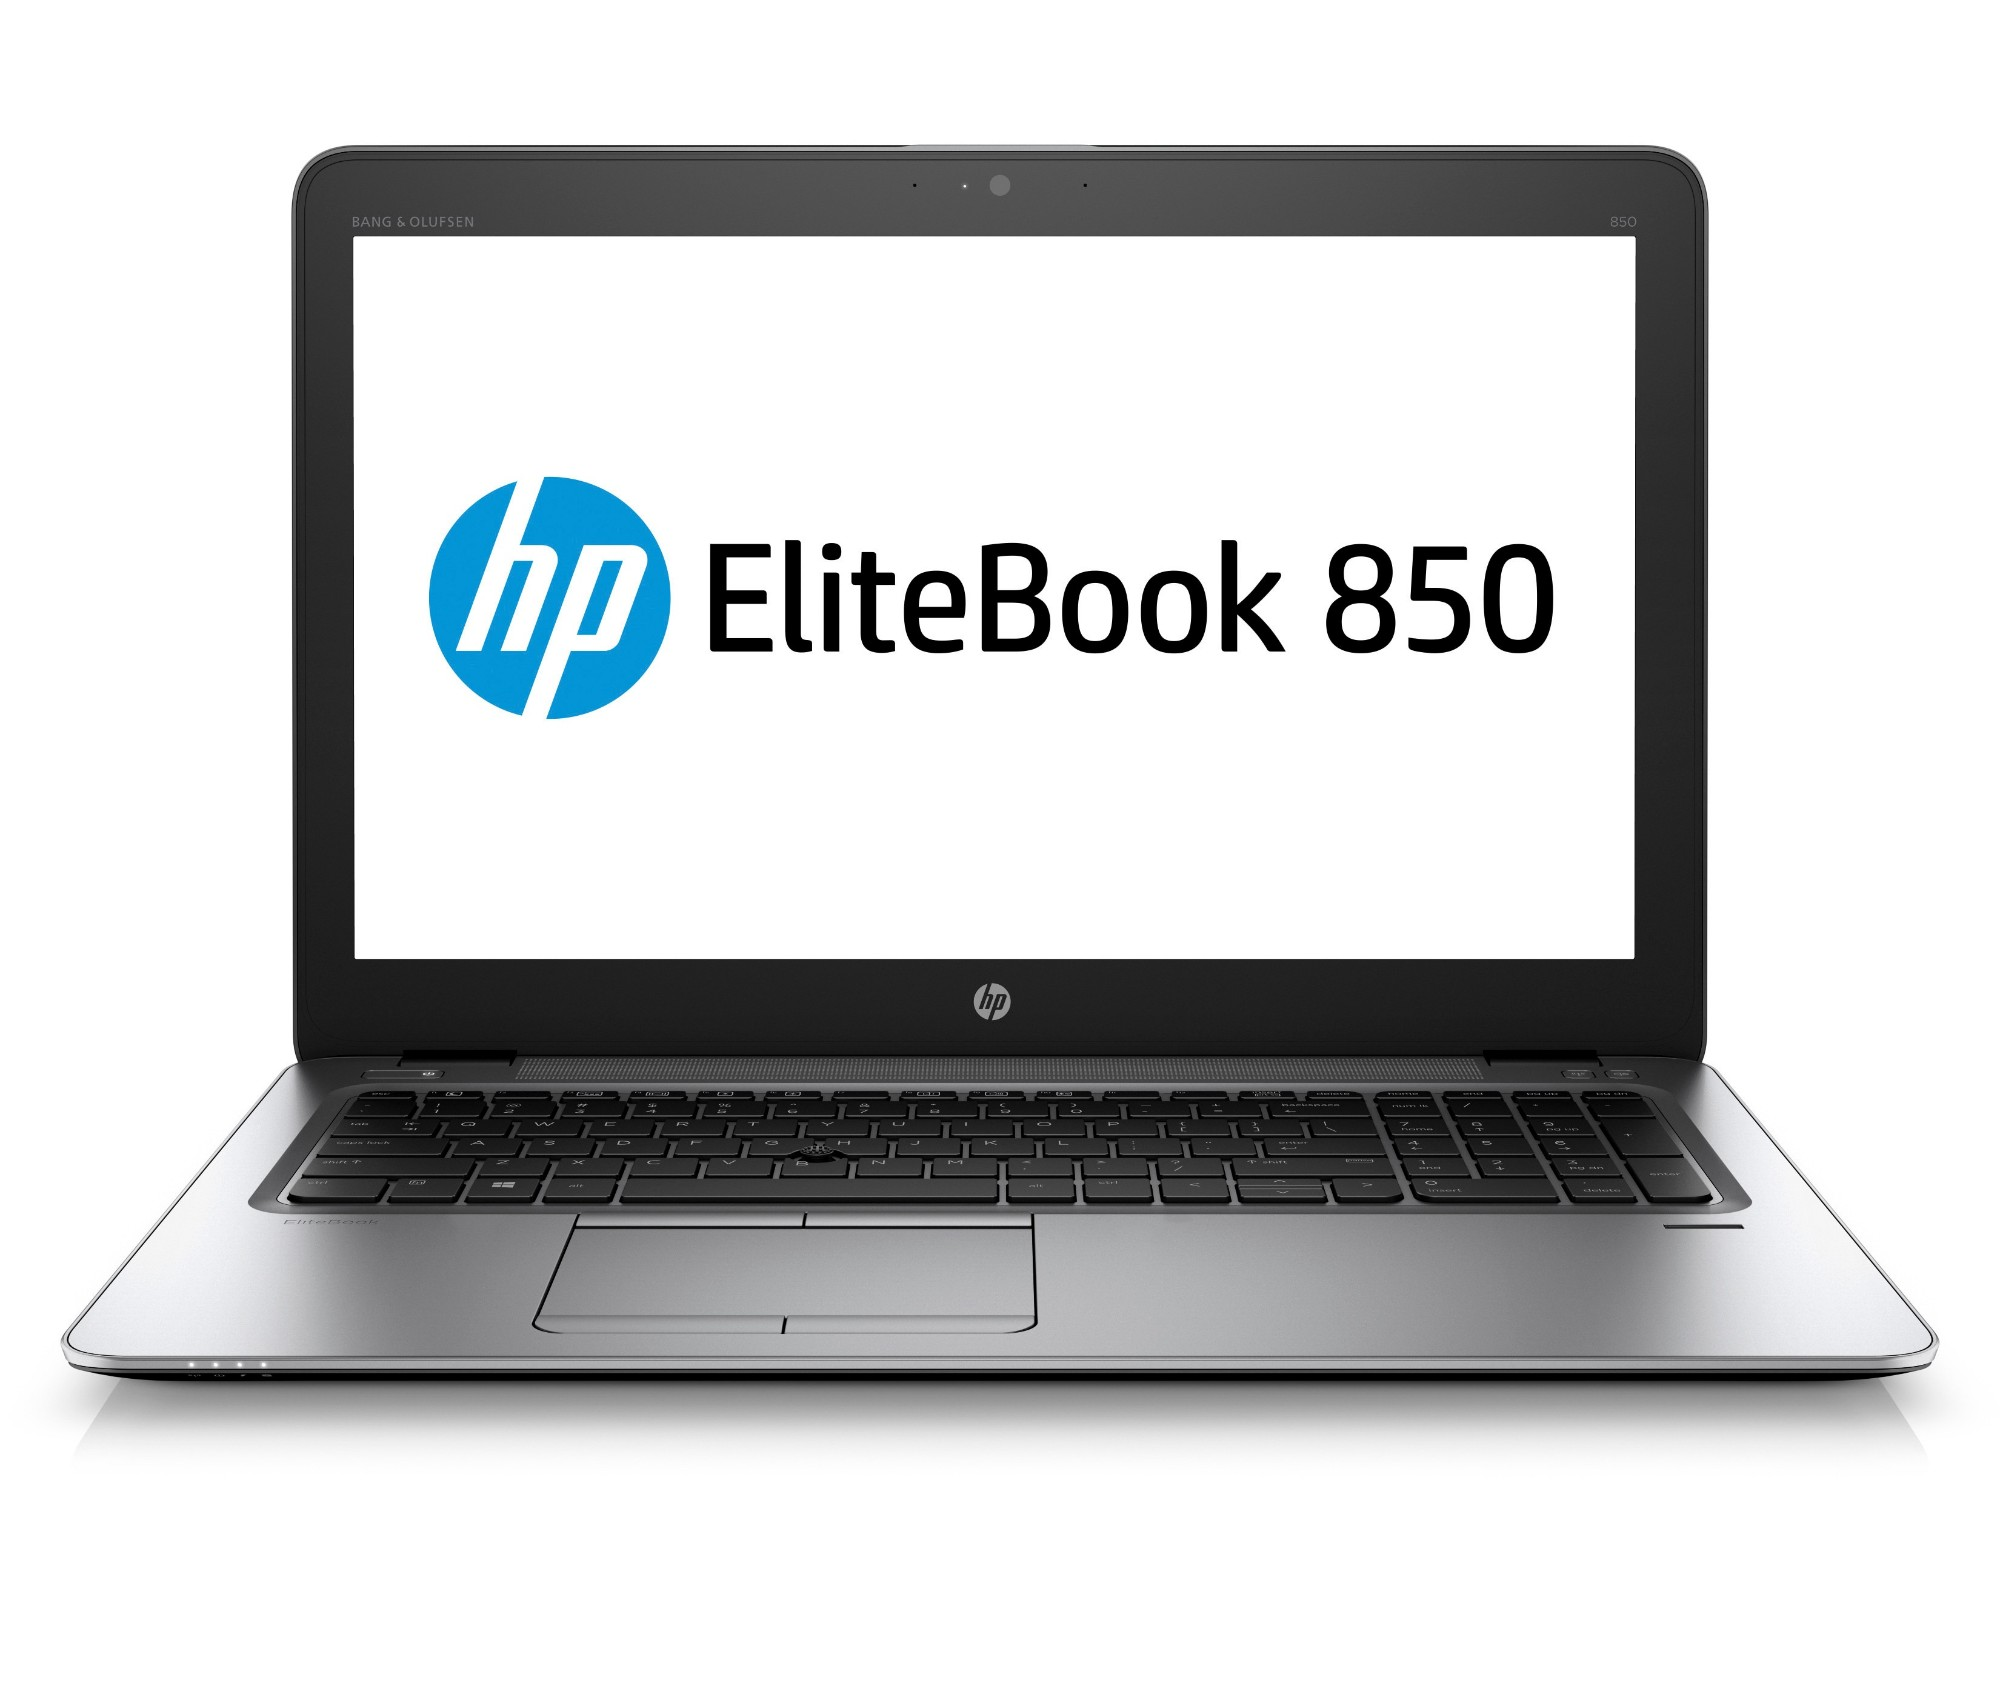 HP EliteBook 850 G3 Notebook PC